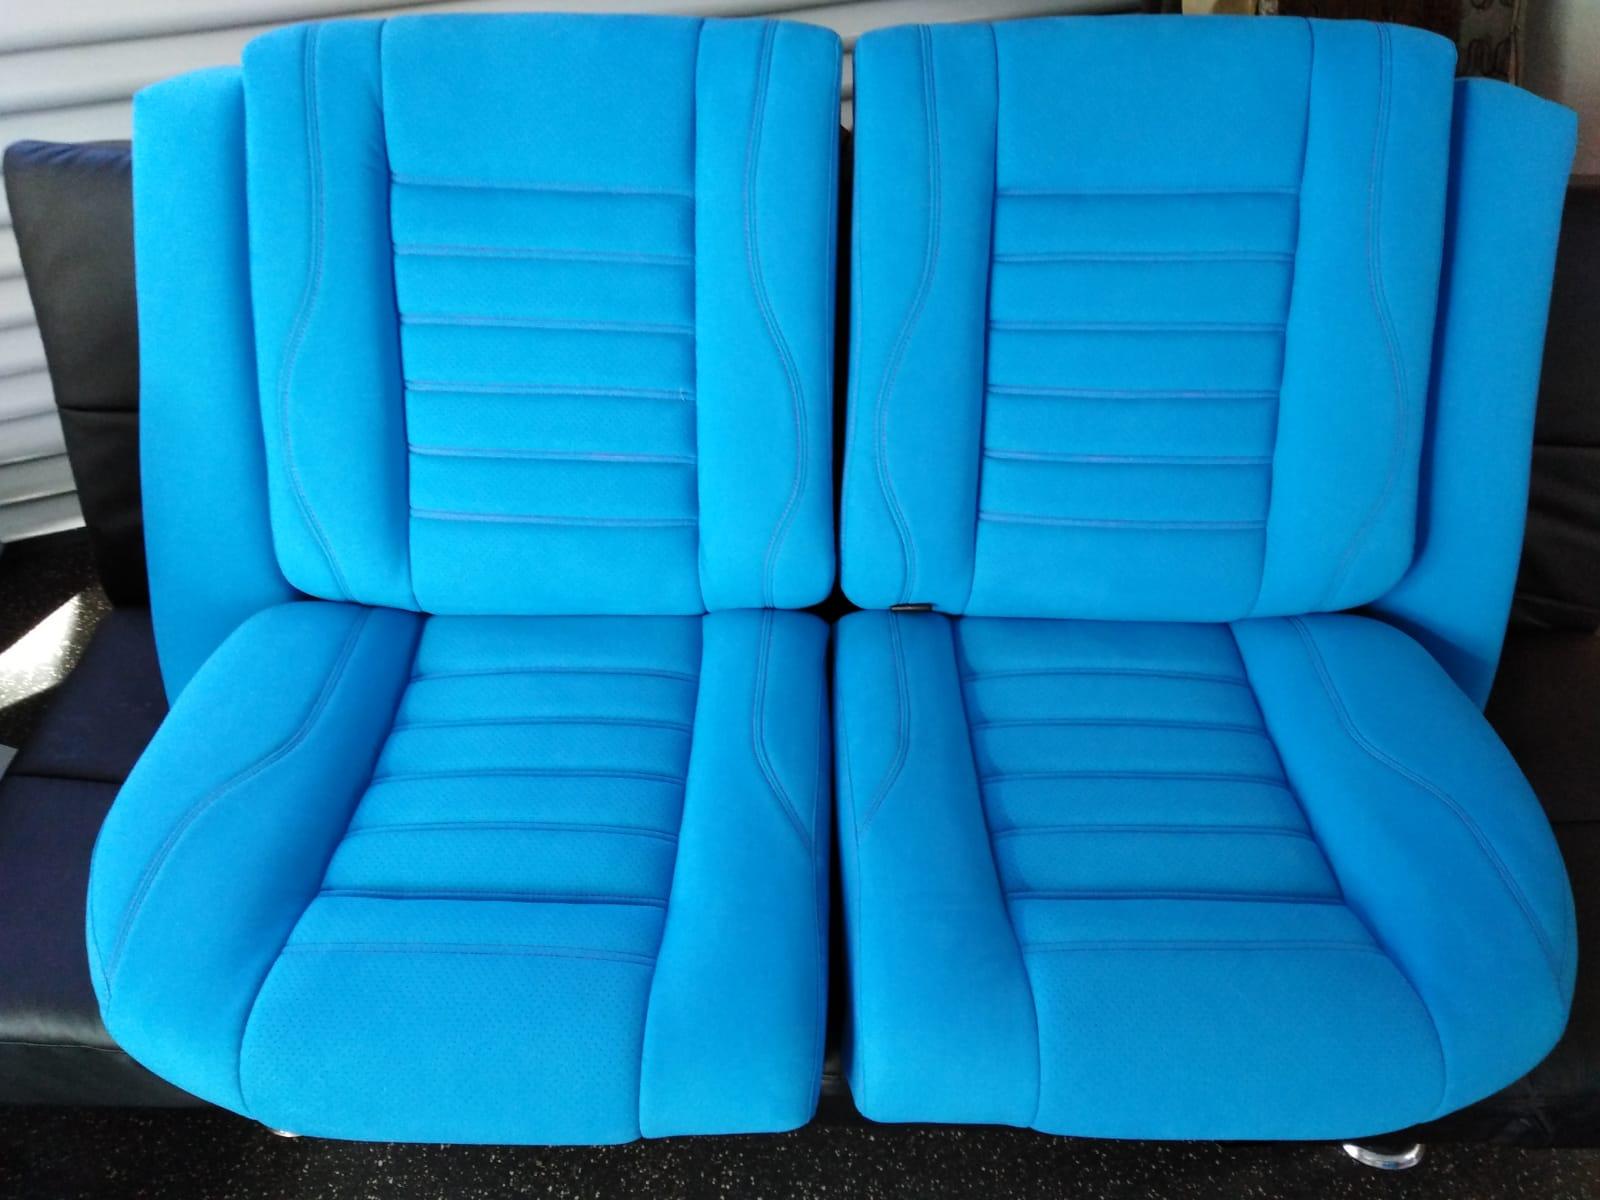 Autositze beziehen K.M. Lederdesign, Polsterer, hinten blau lederverarbeitung beziehen polstern